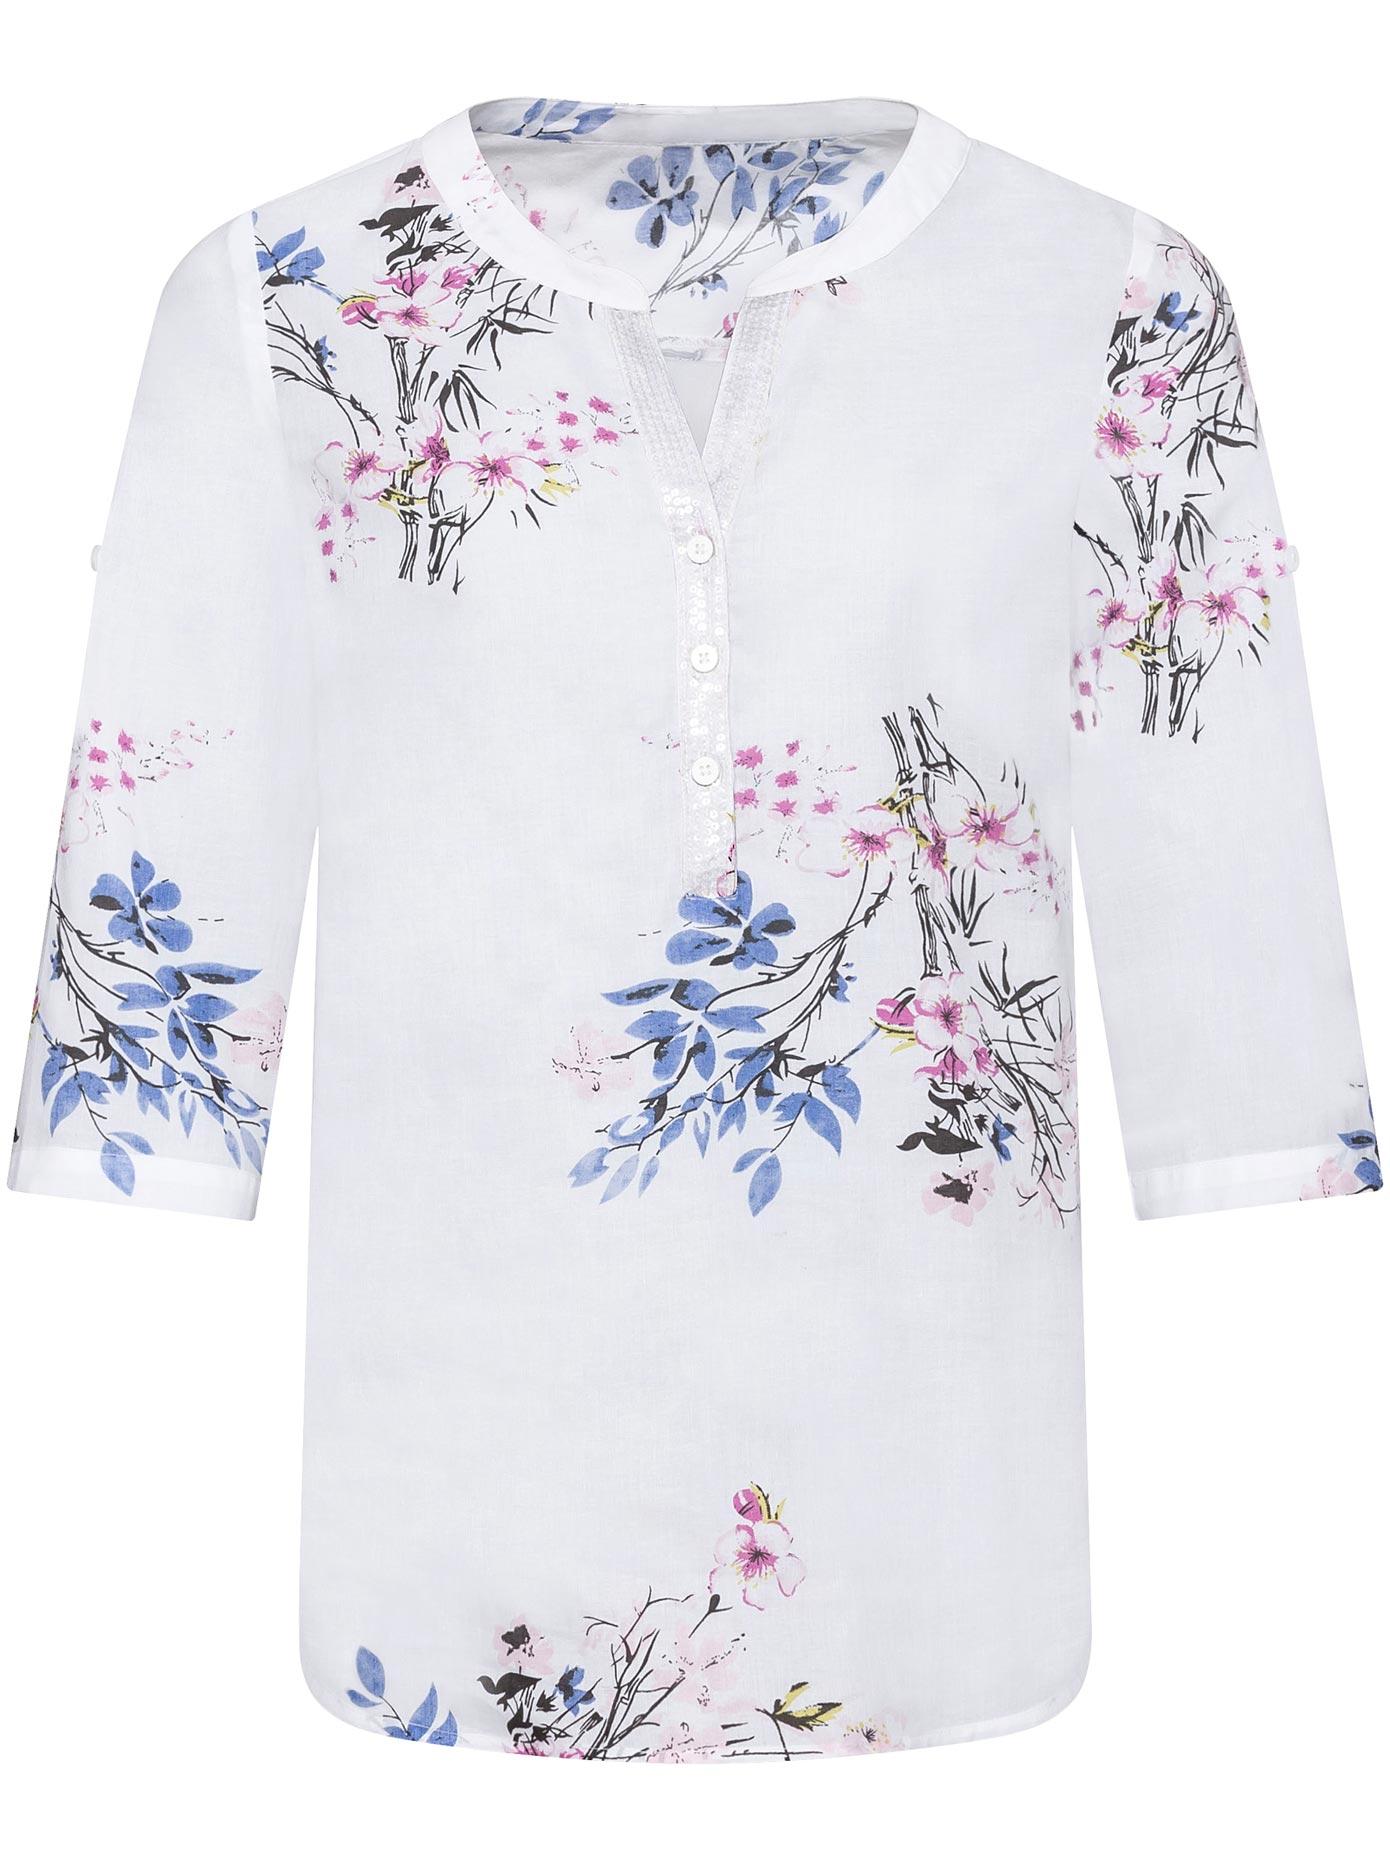 Classic Basics Bluse im floralen Dessin